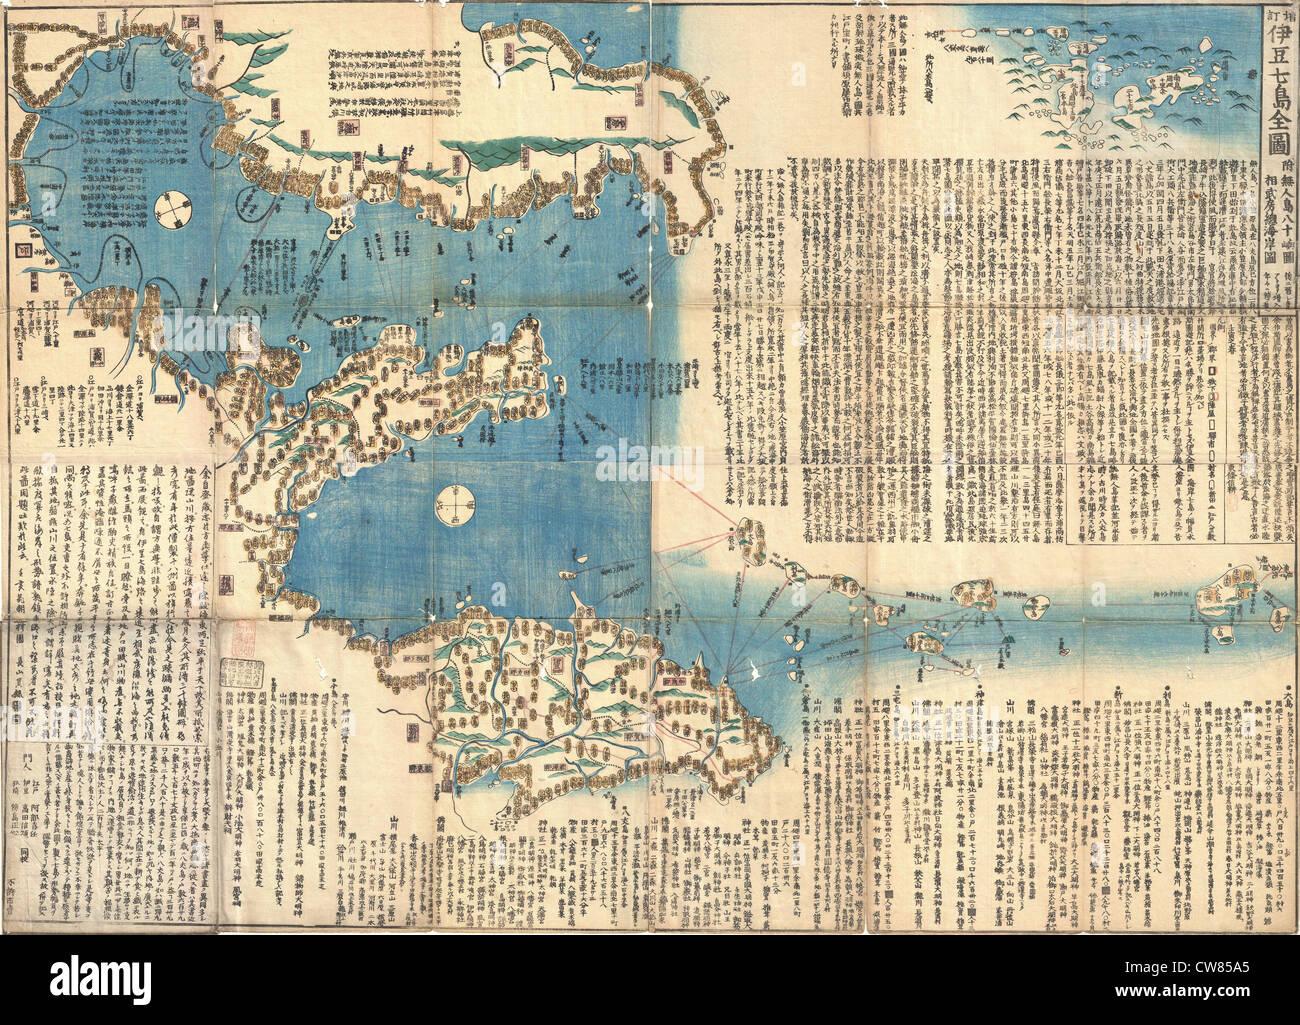 1847 Japanese Edo Period Woodblock Map of the Izu Islands (Tokyo or Edo) - Stock Image